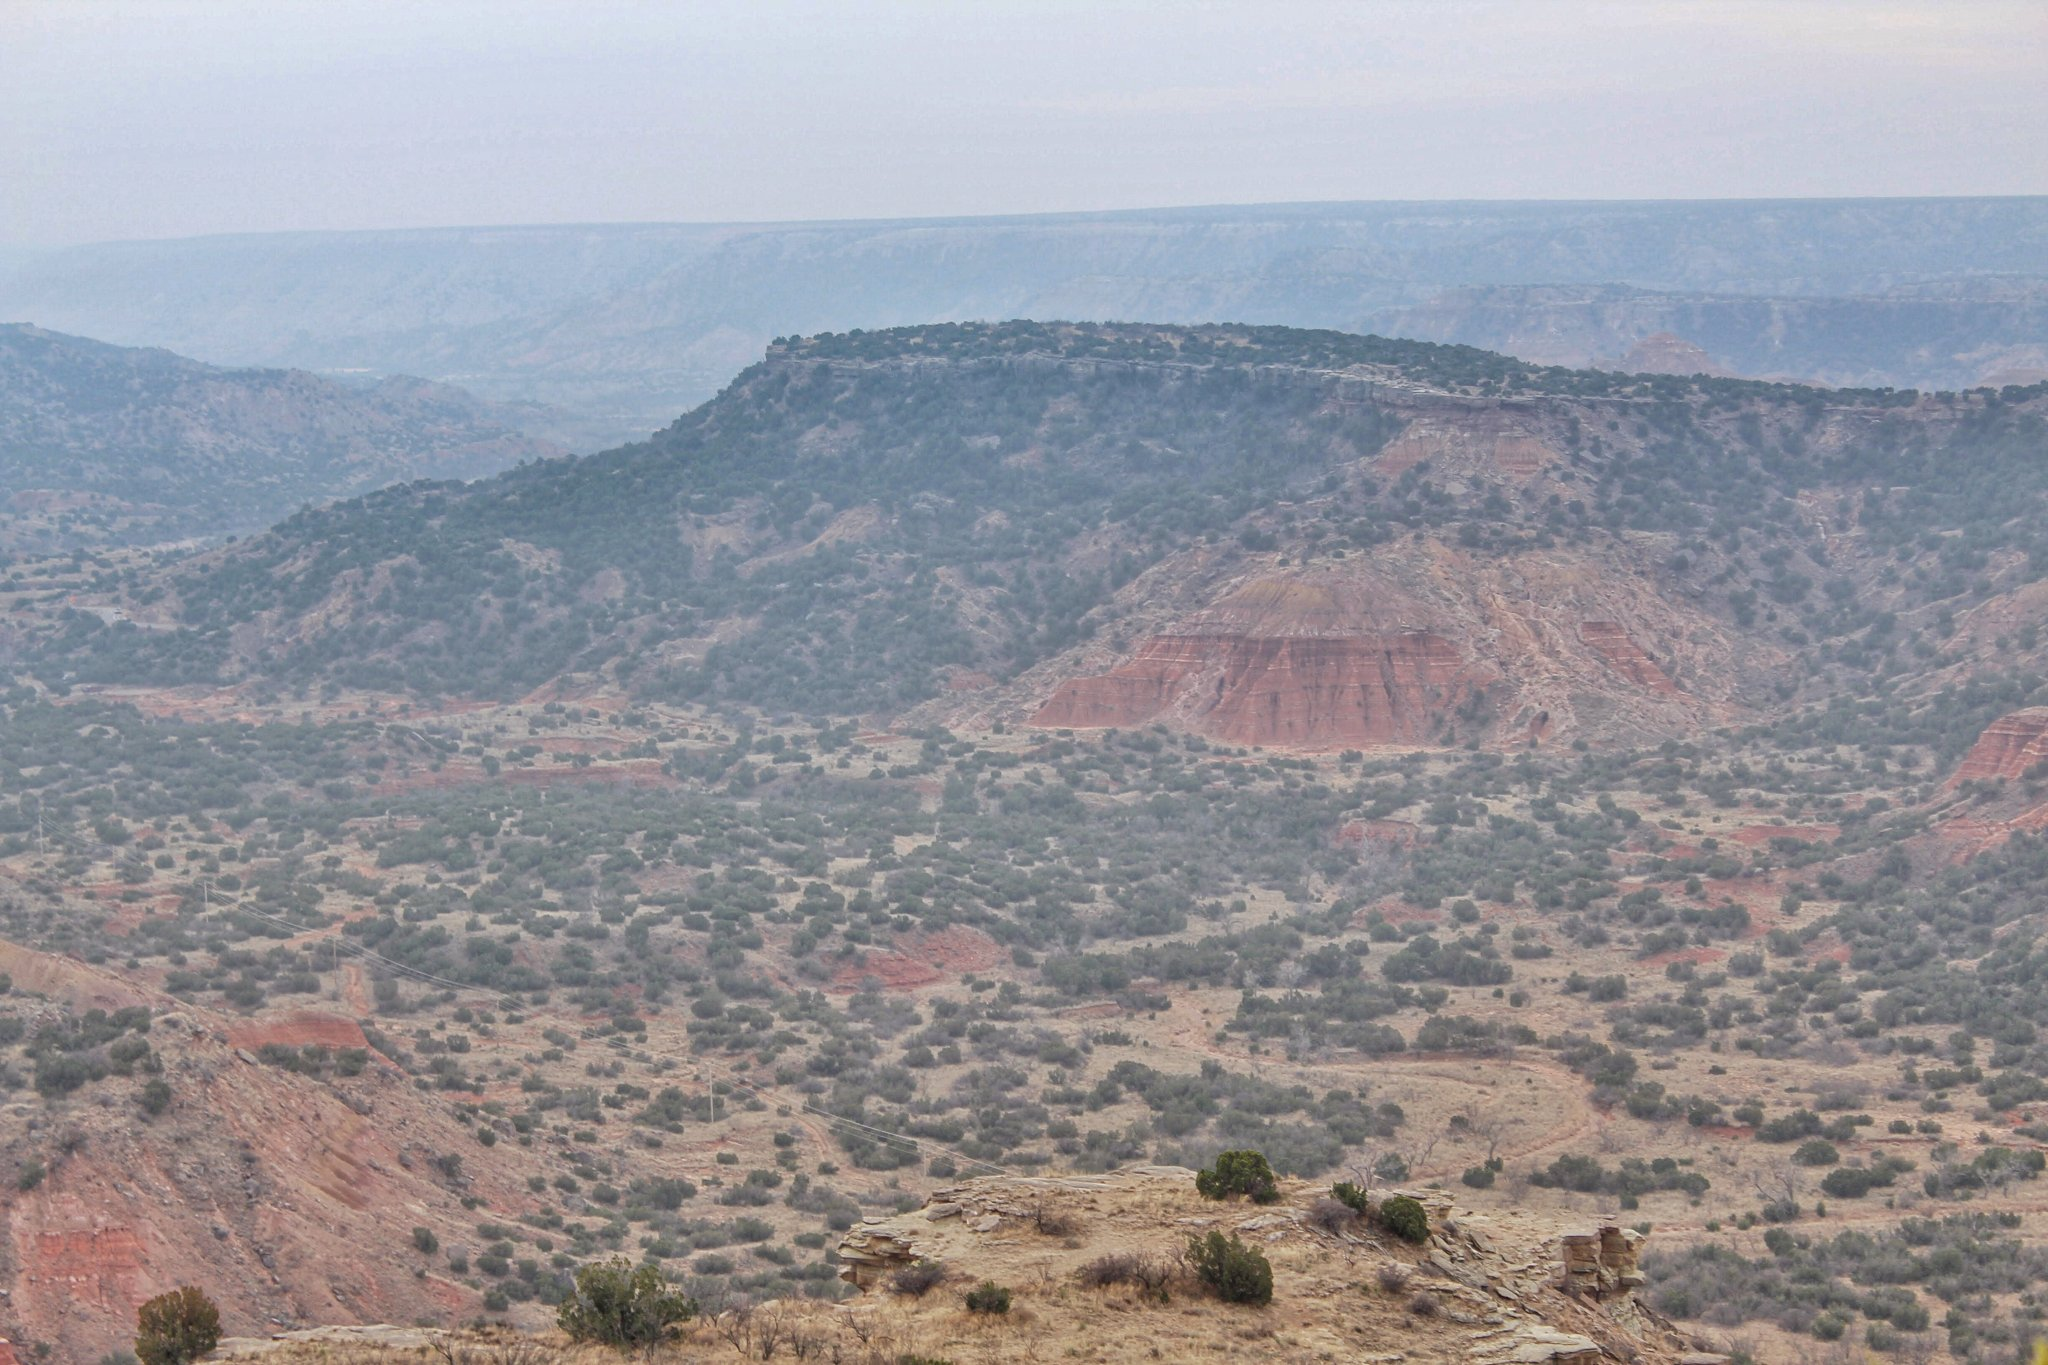 Exploring Palo Duro Canyon - Beautiful Shrubs dotting the landscape